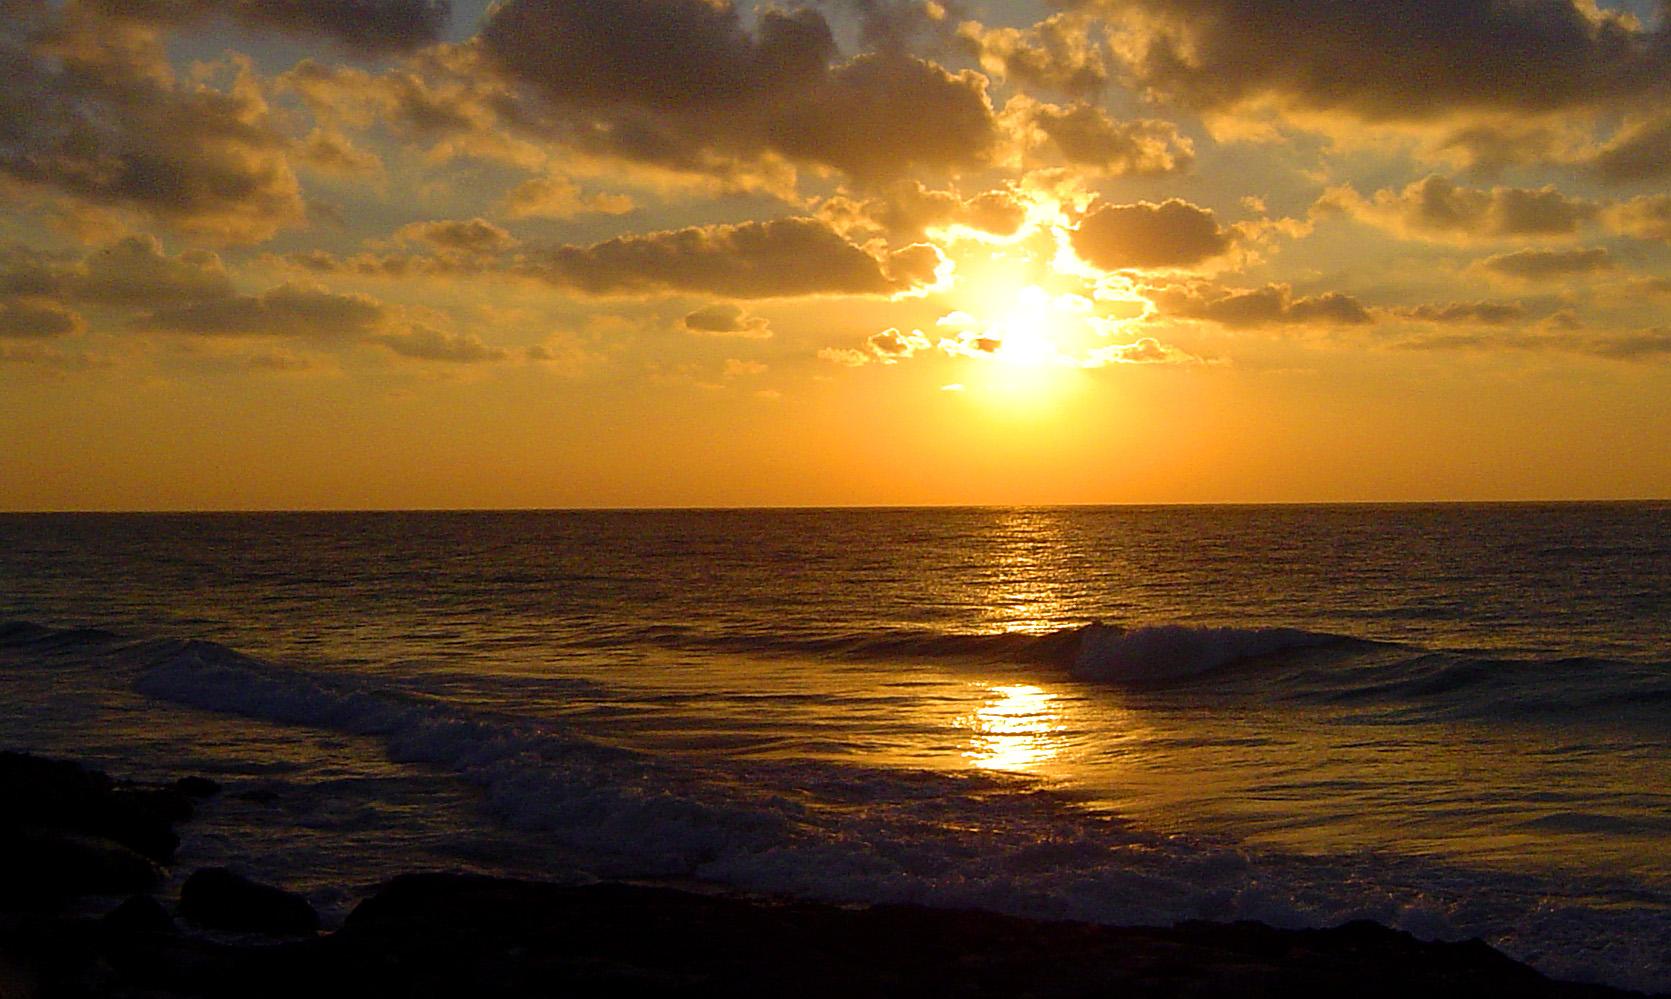 Sunrise 3d Wallpaper Free Stock Photo 1791 Caribbean Sunset Freeimageslive